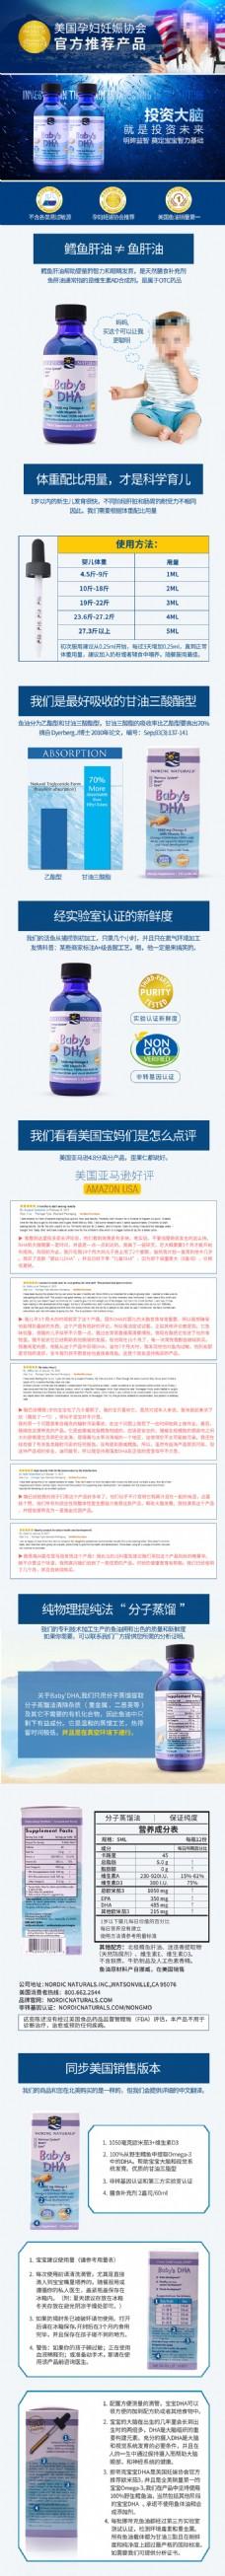 60ml7月版淘宝电商详情页保健品